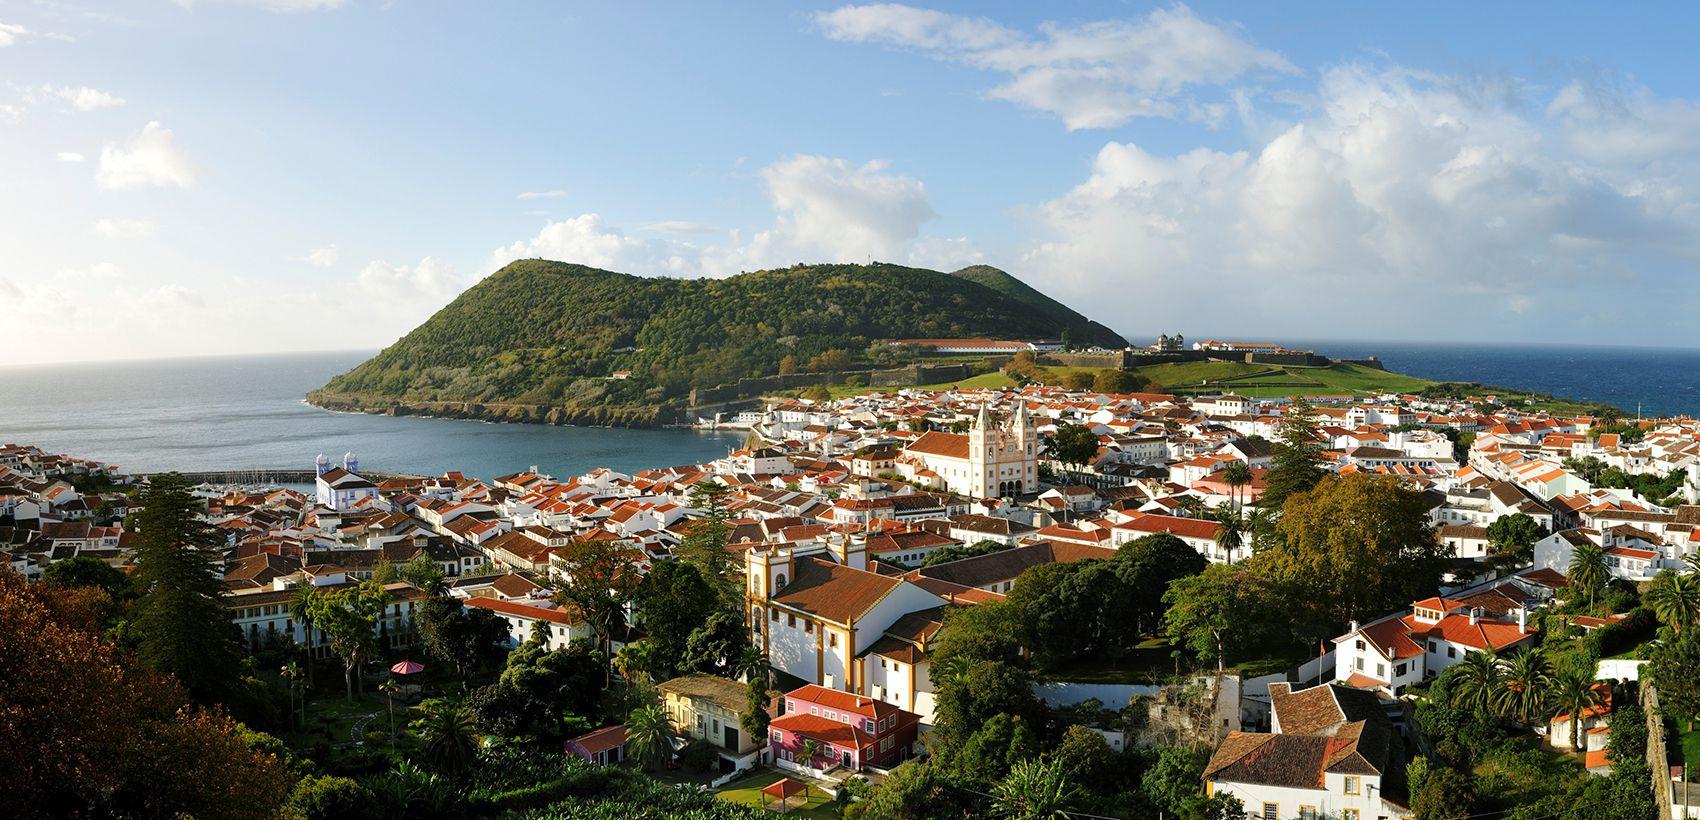 Lisboa ou Porto » Terceira - 01.05.17 a 31.10.17